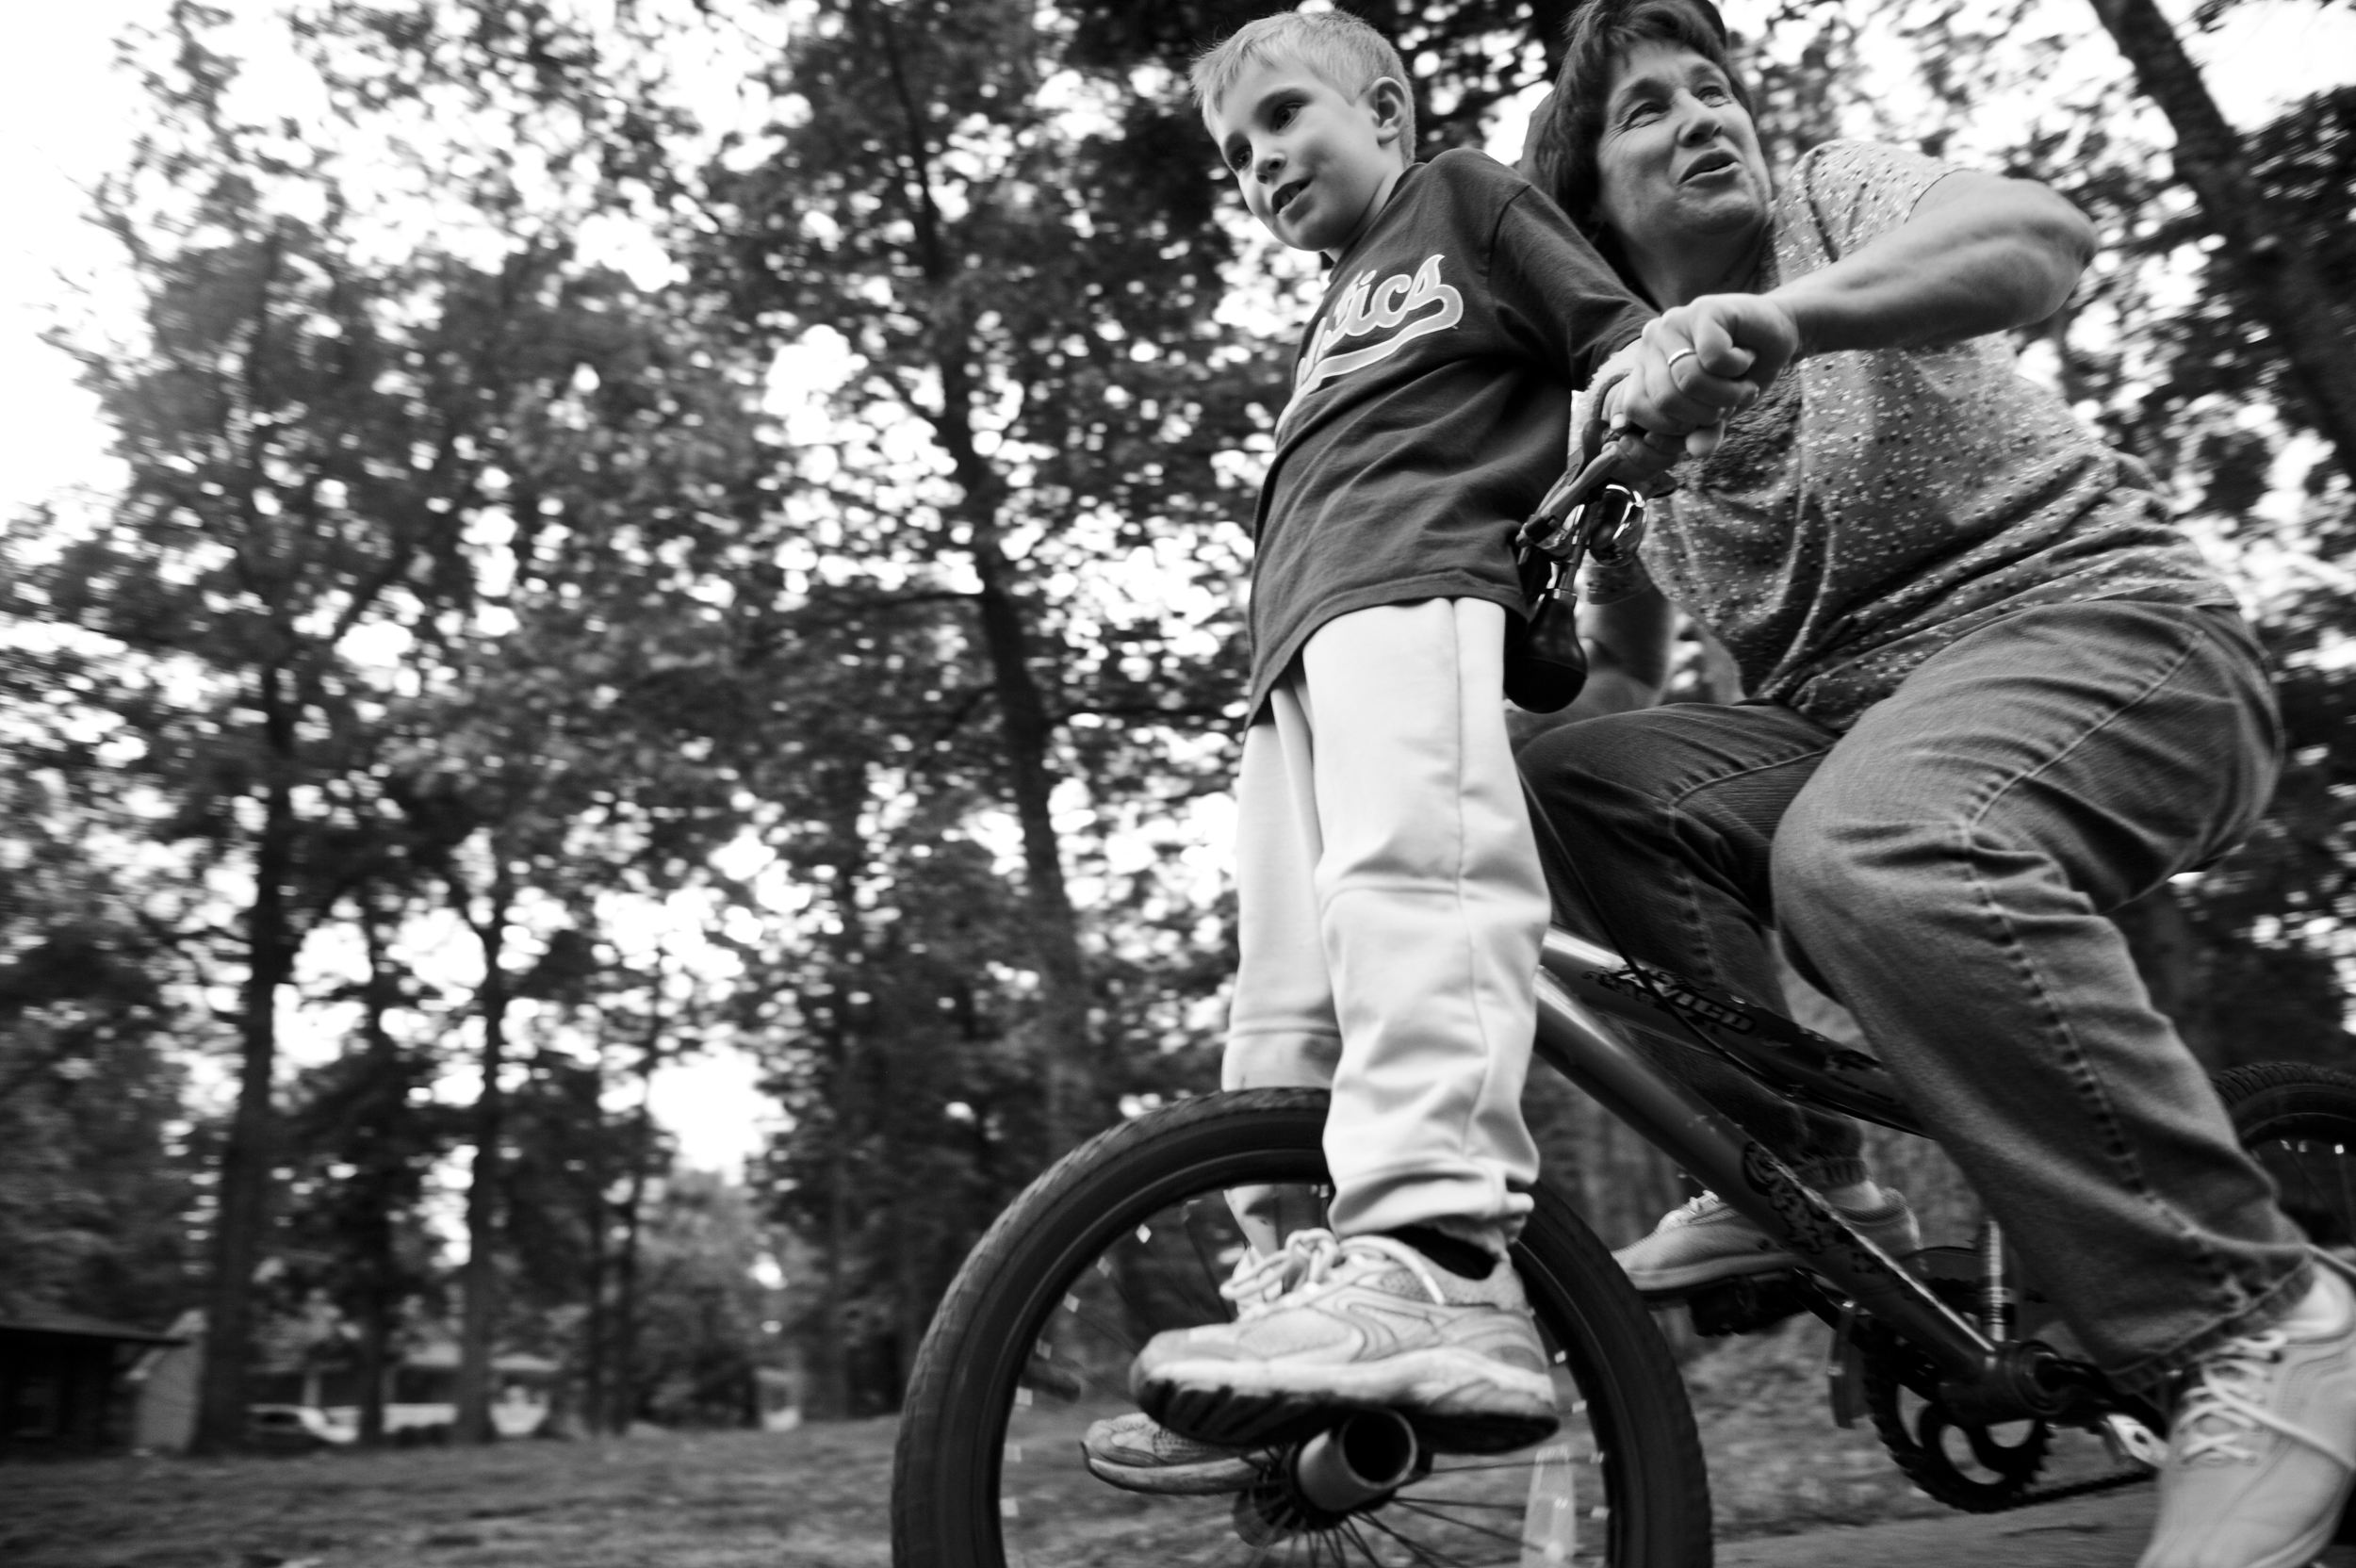 Joyce and Brian ride around on Brian's bike.